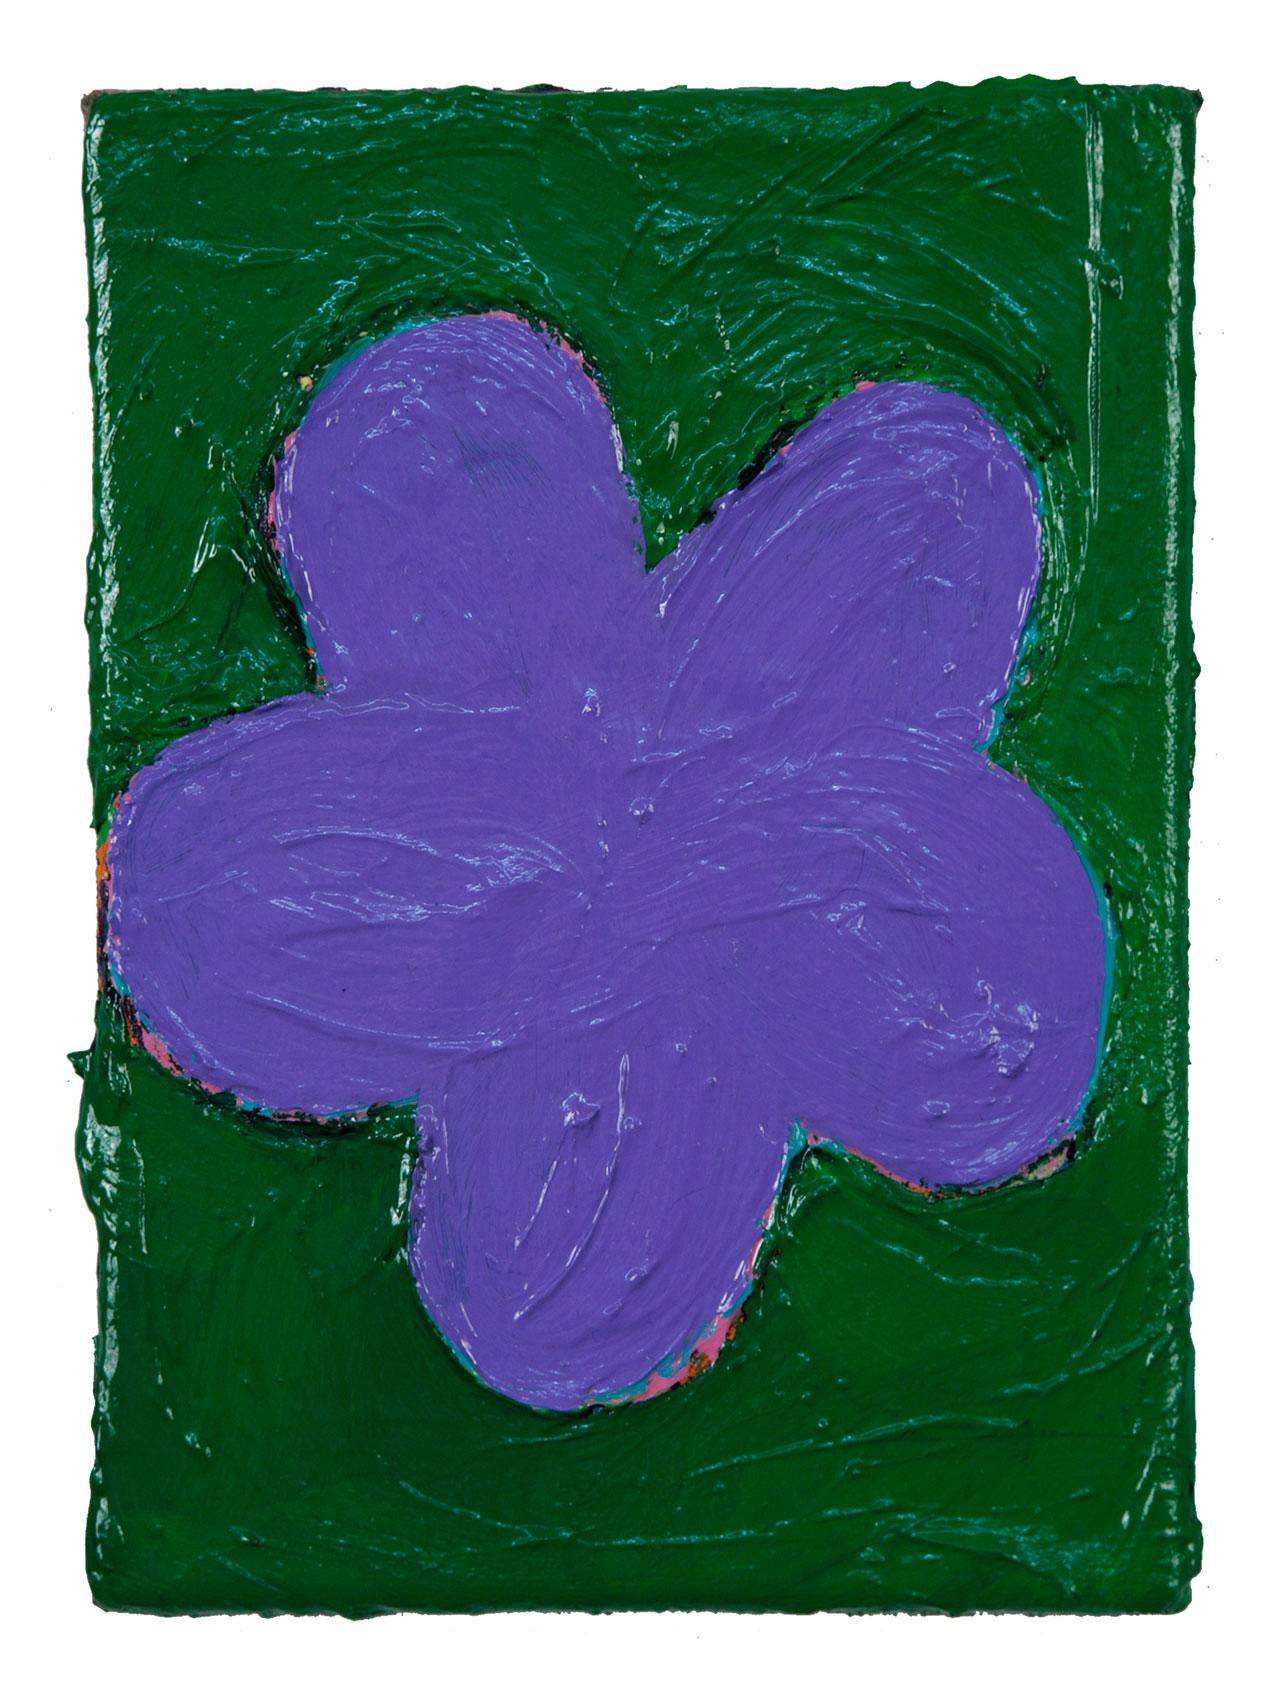 25 Flowers 18 | 2008 © Kerstin Jeckel | MEMORY-PROJEKT # extra